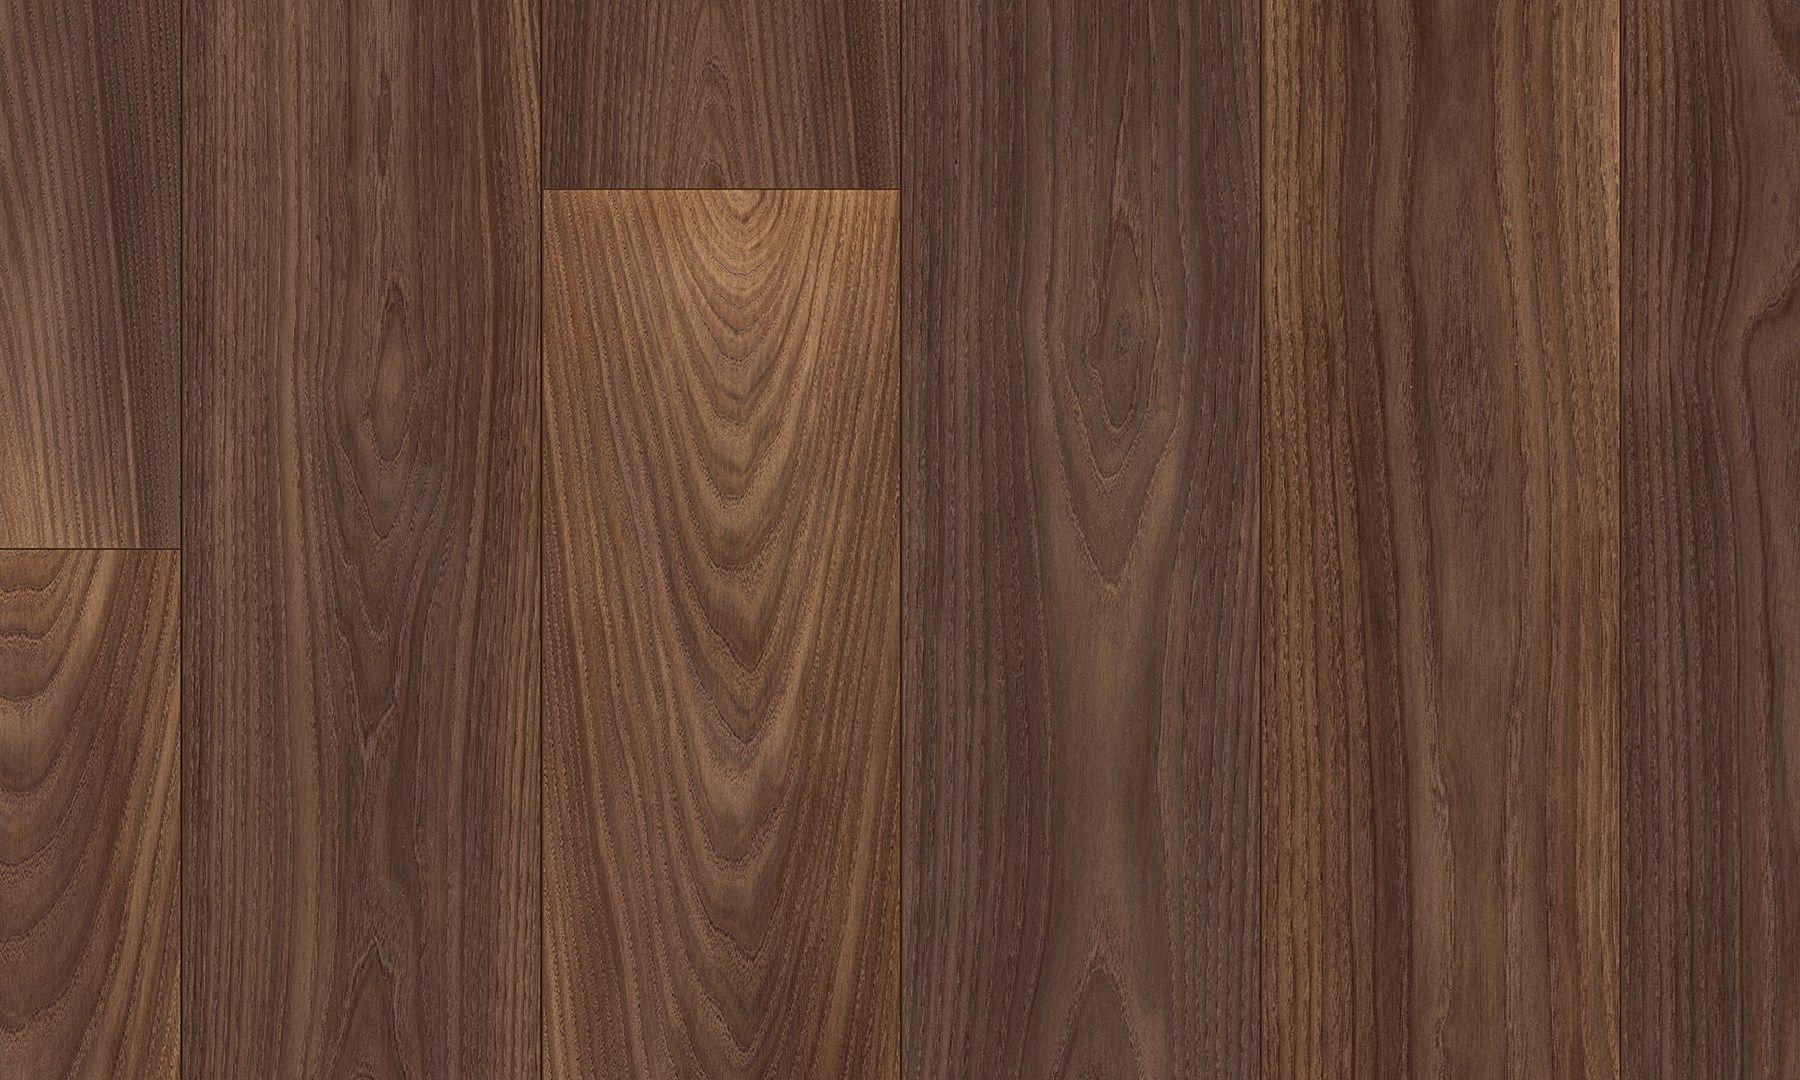 Pavimento en laminado imitaci n madera nogal alpine by pergo - Pavimento imitacion madera ...